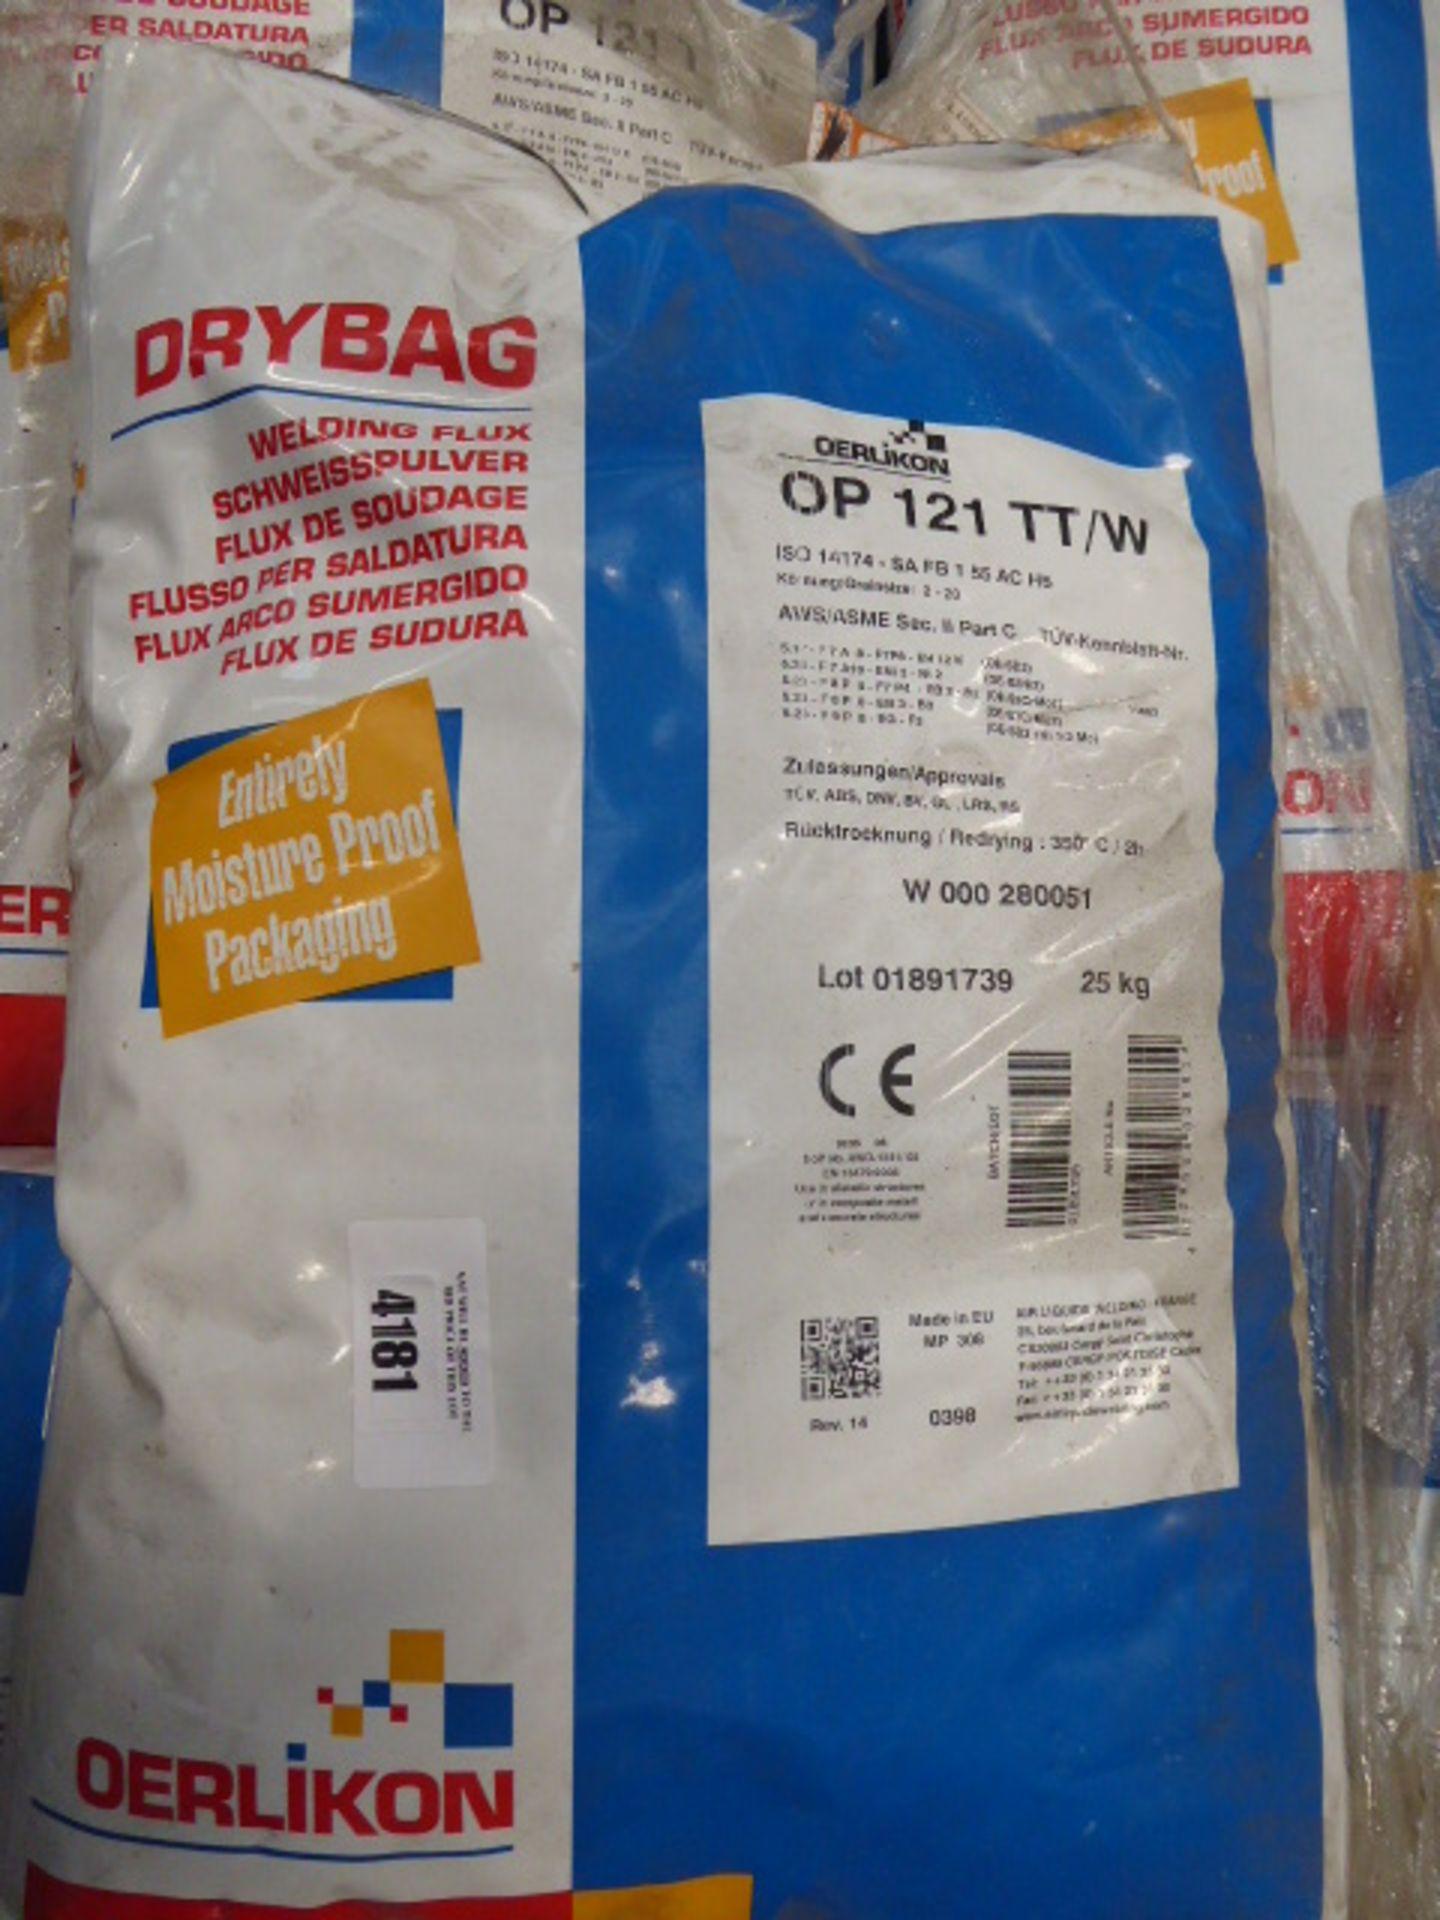 A pallet of Dry Bag welding flux - Image 2 of 2